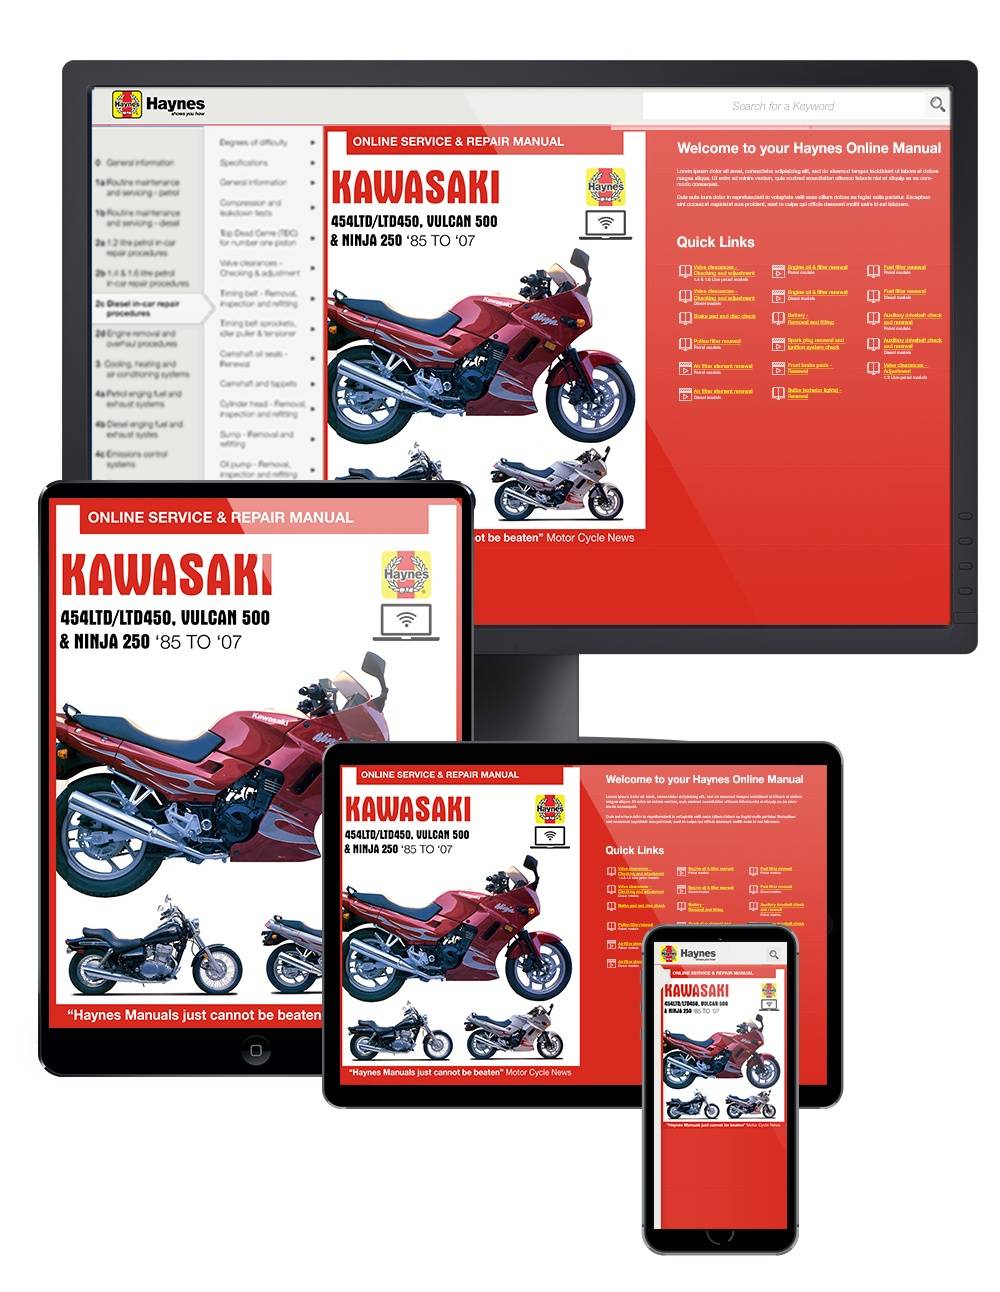 Kawasaki EN450 and 500 Twins Haynes Online Manual covering EN450 (454LTD/LTD450) for 1985 to 1990, EN500 or Vulcan 500 for 1990 to 2007, and EX250 or Ninja 250